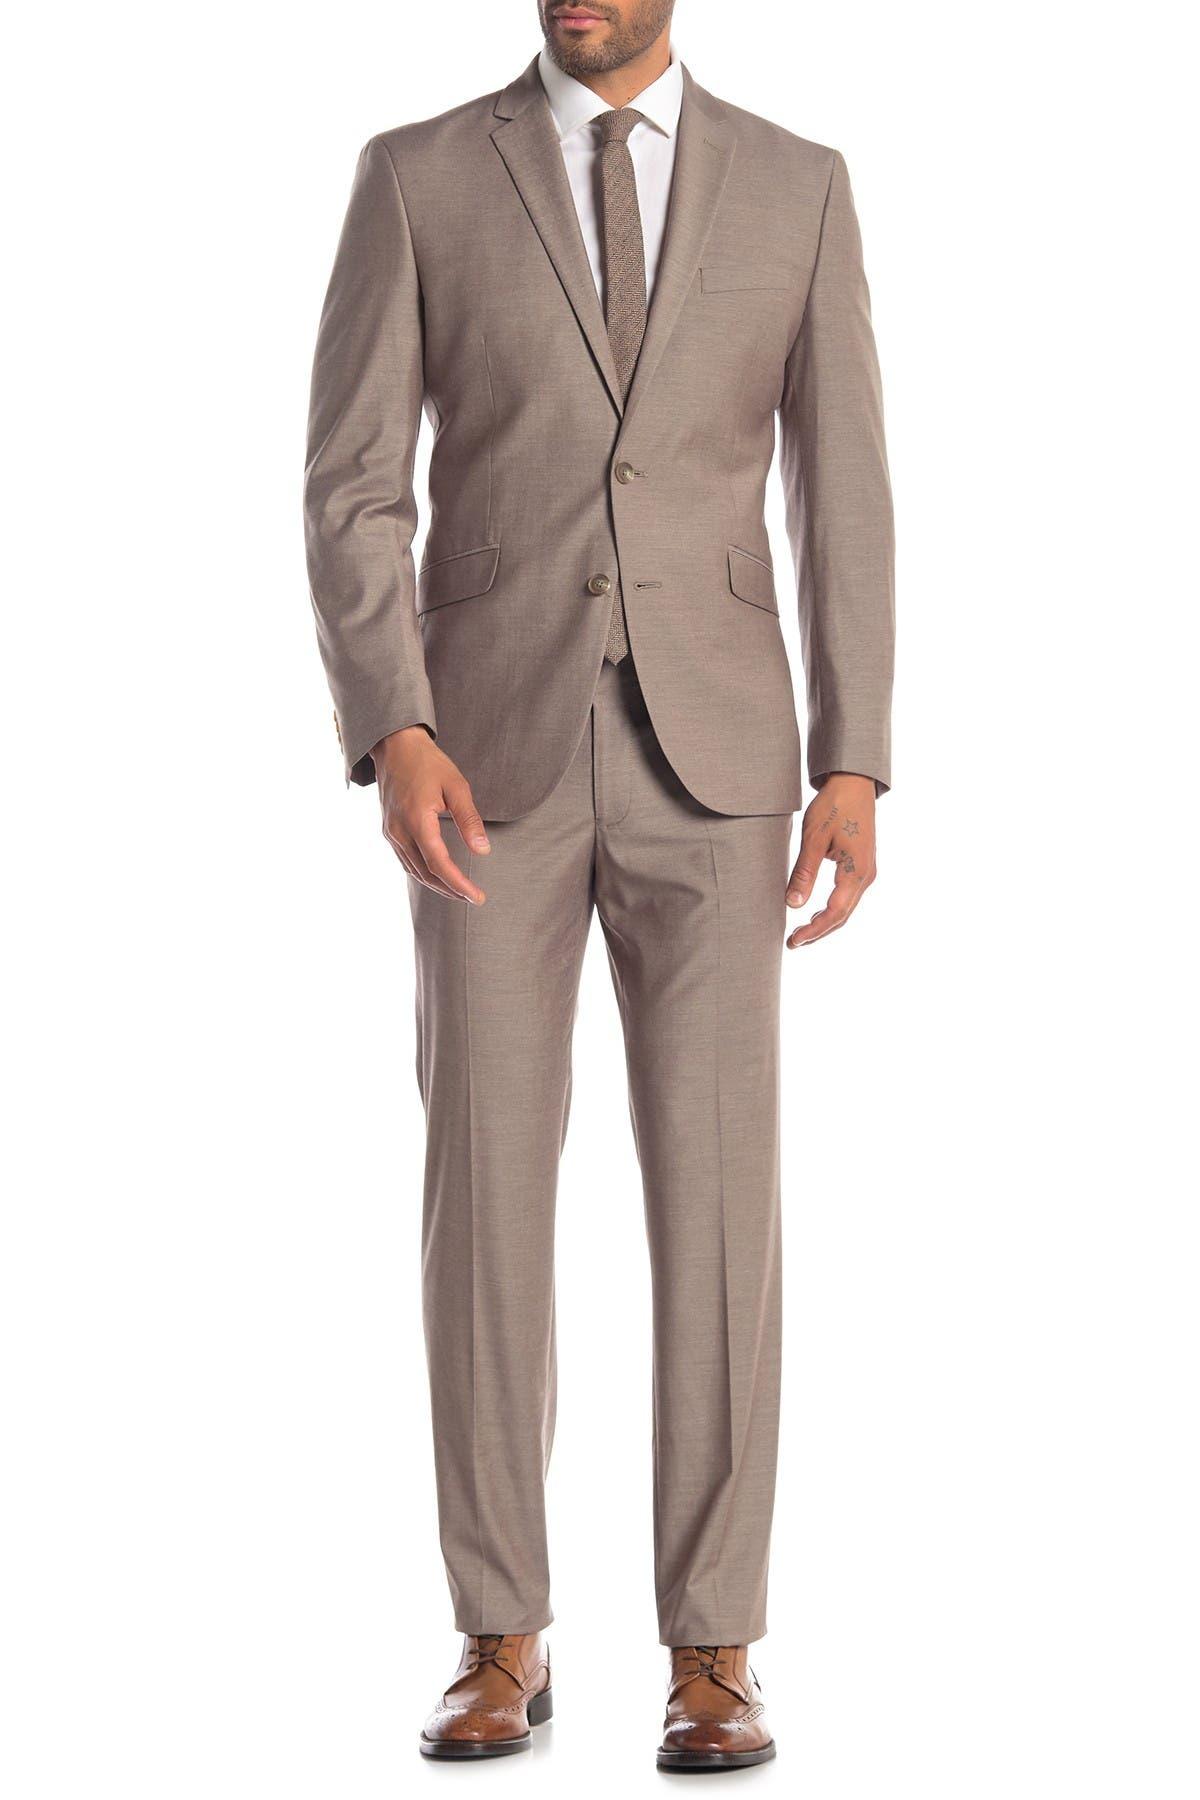 Image of Kenneth Cole Reaction Dark Tan Solid Two Button Notch Lapel Techni-Cole Slim Fit Suit